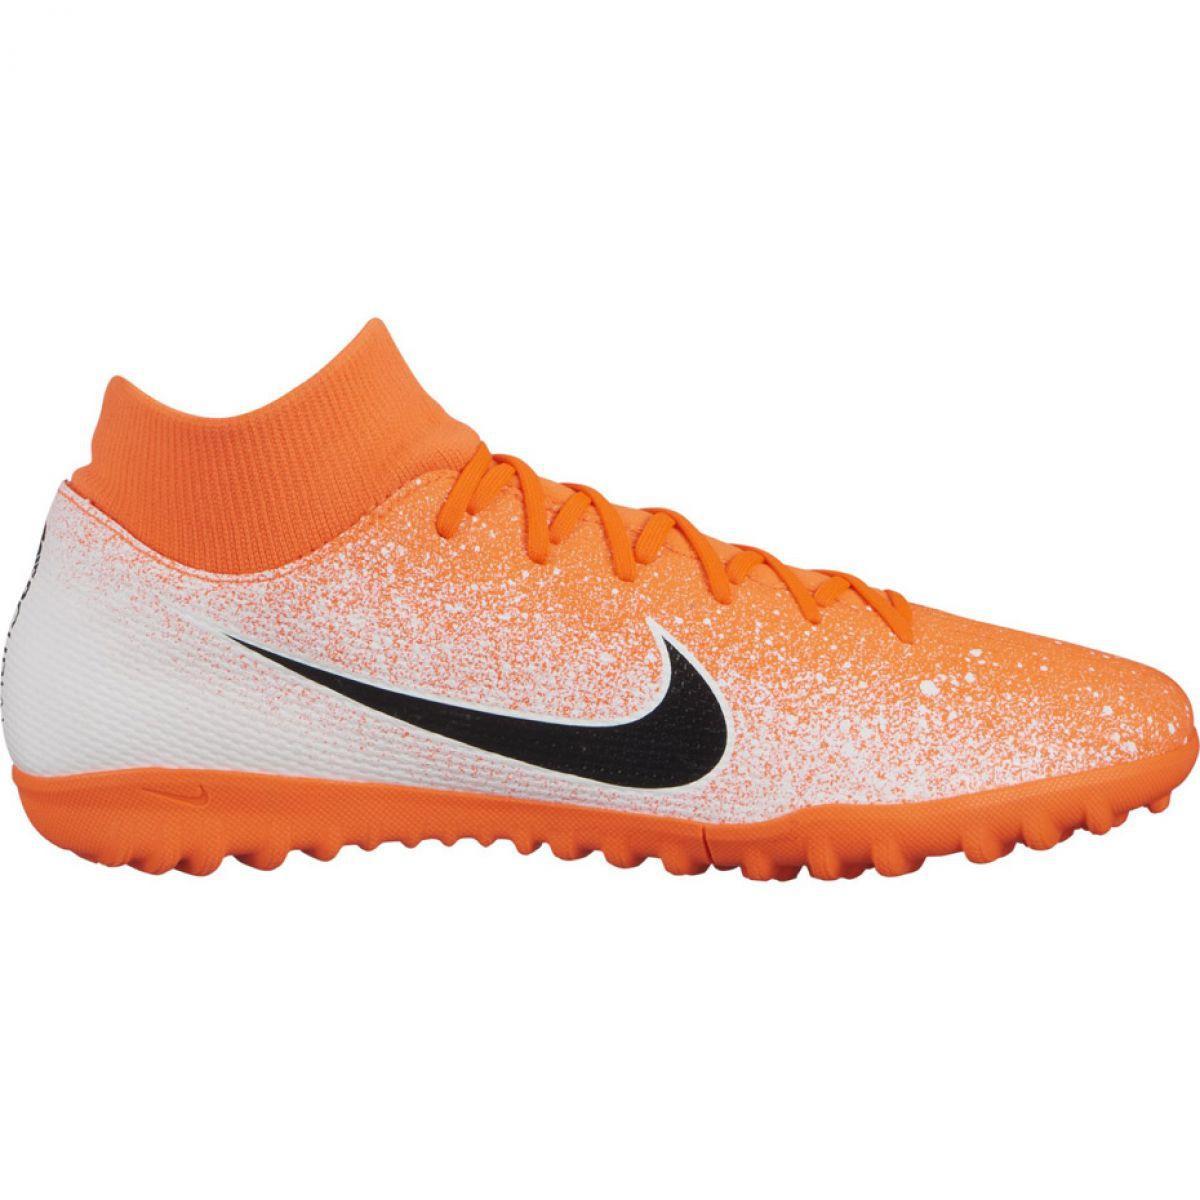 fa88515c Nike Mercurial Superfly X 6 Academy Tf M AH7370-801 Fodboldstøvler ...